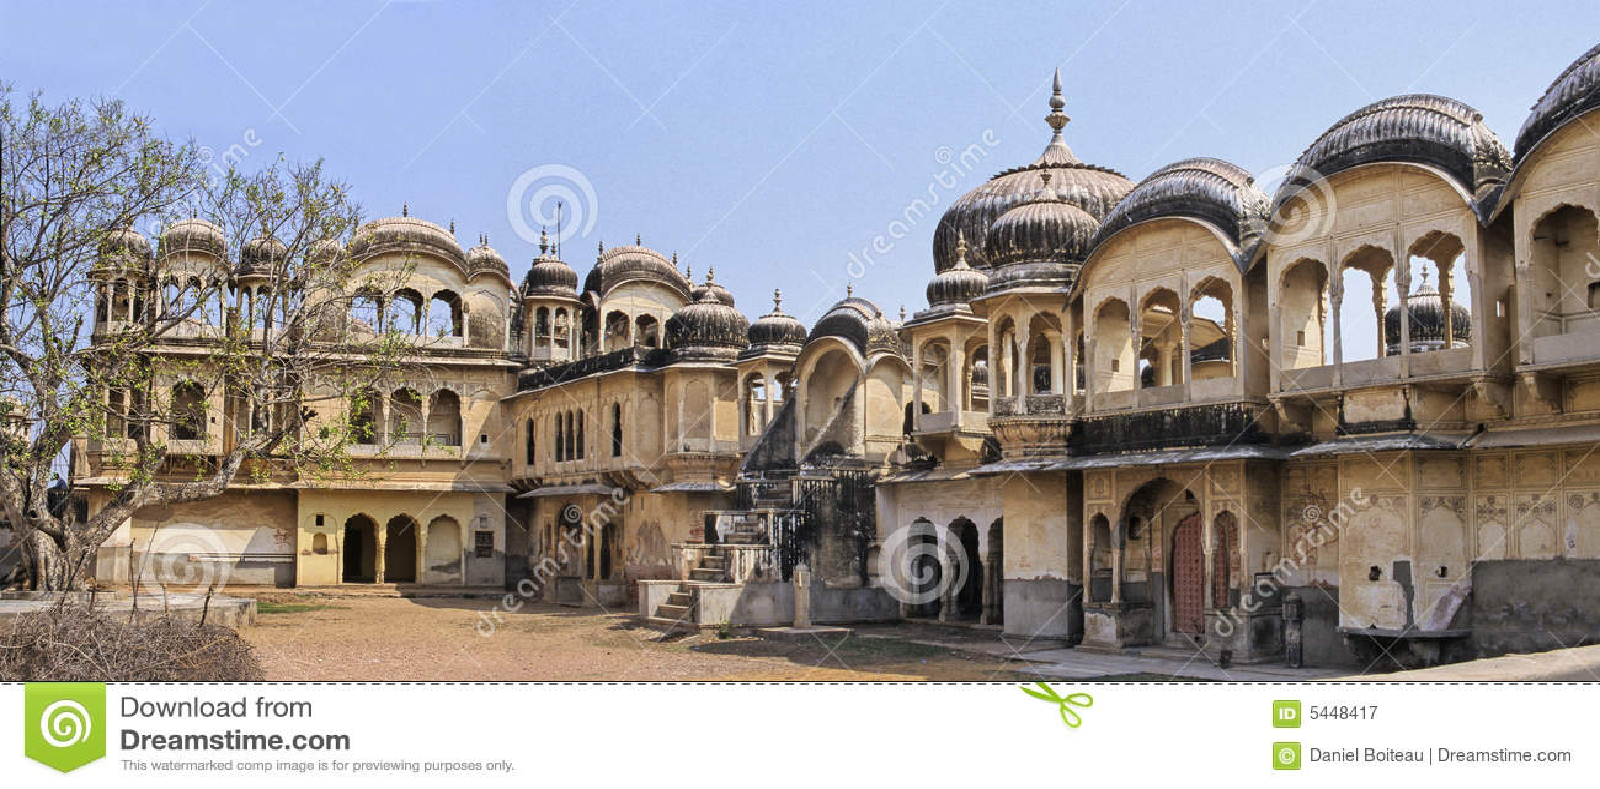 Palacio de Shekhawati